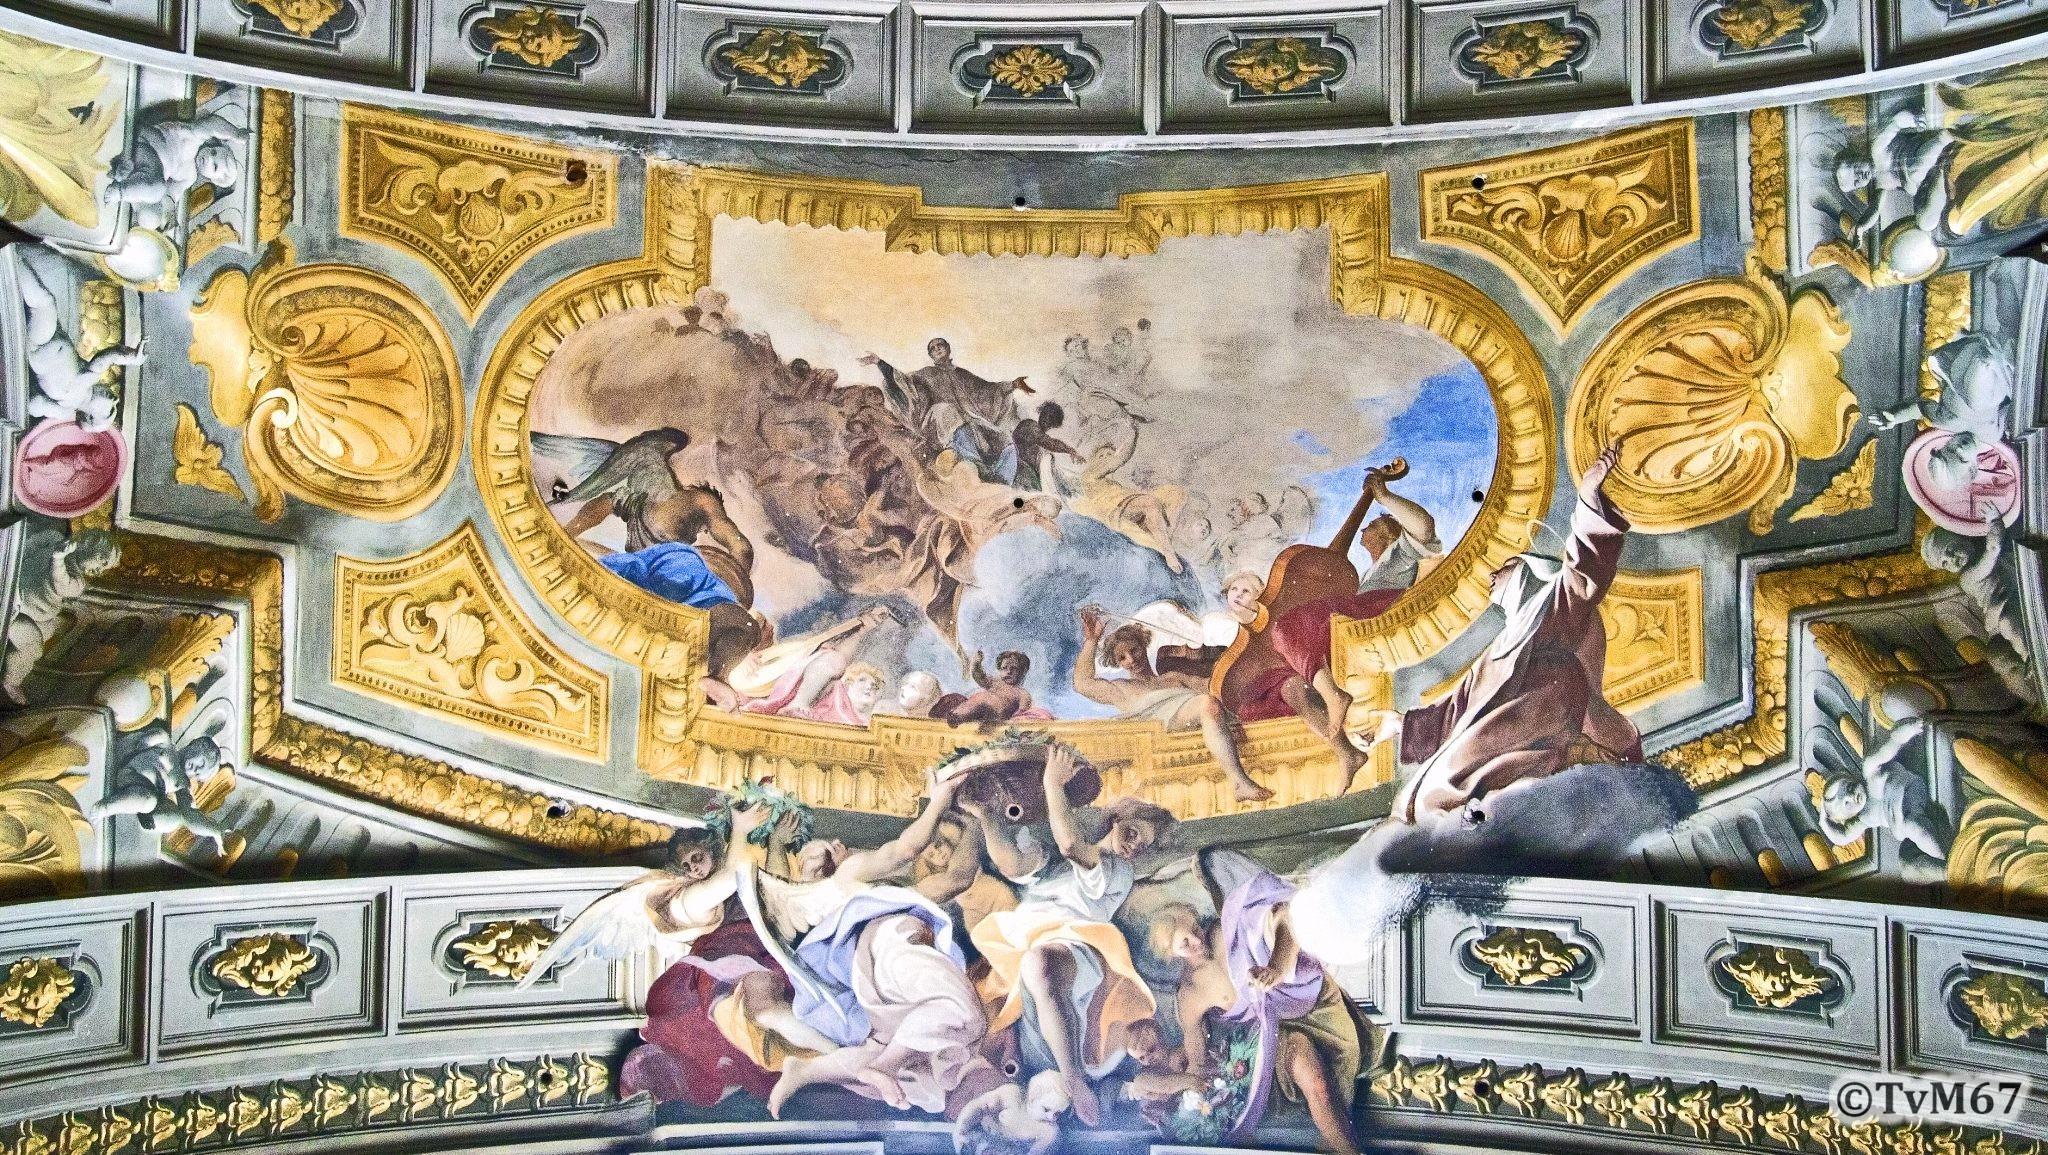 Roma, Chiesa di Sant'Ignazio, trans re, gewelfboog, 2011